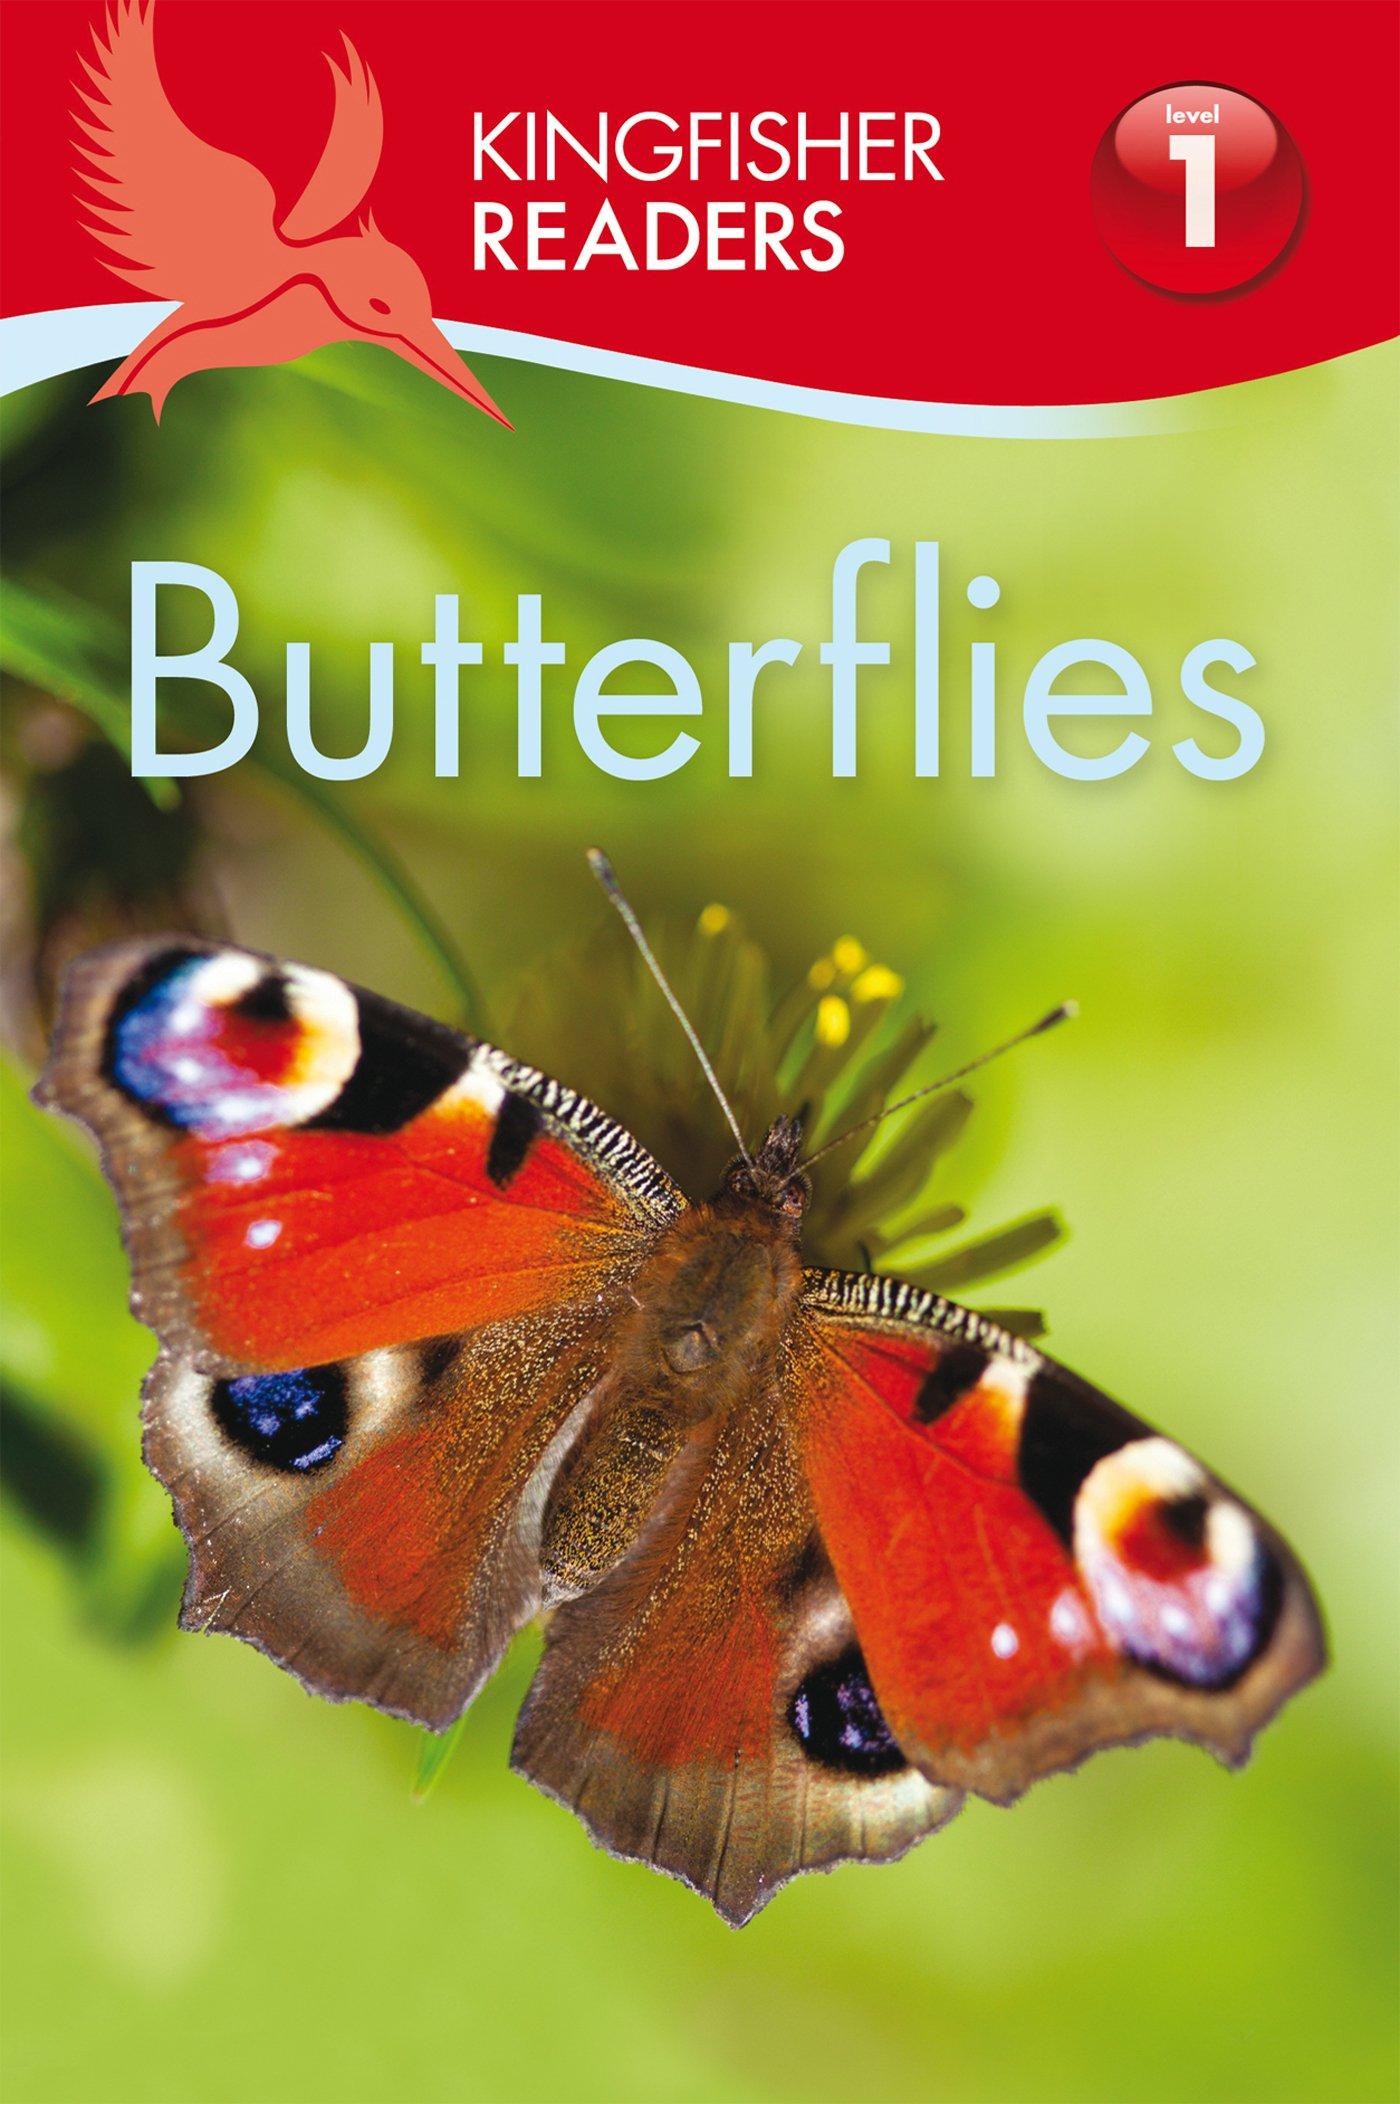 Download Kingfisher Readers L1: Butterflies ebook